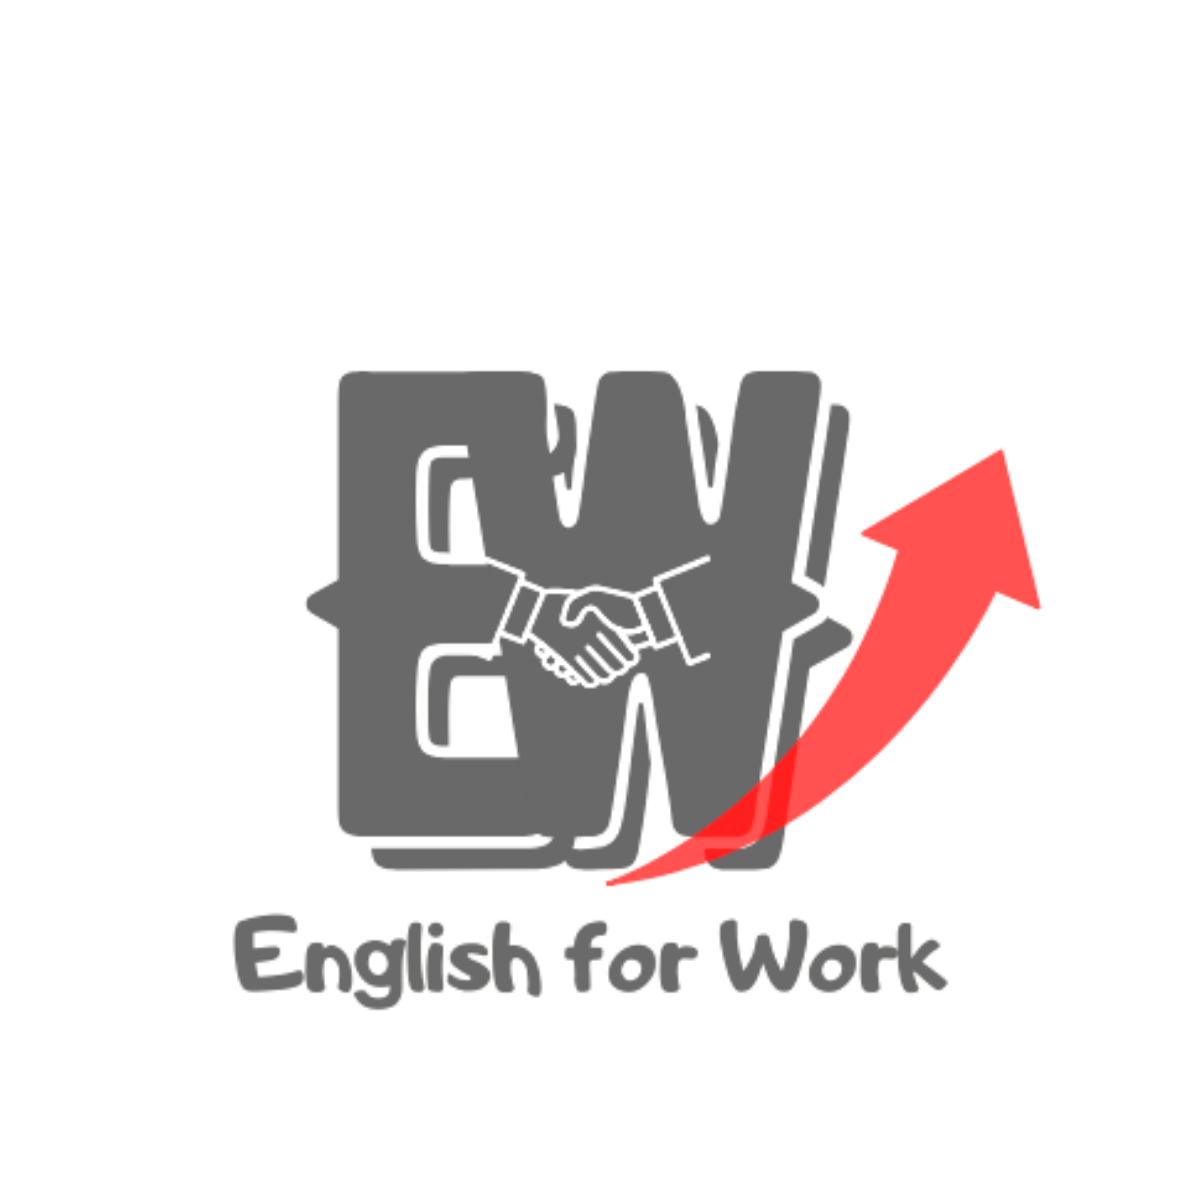 Онлайн-курс делового английского языка English for Work